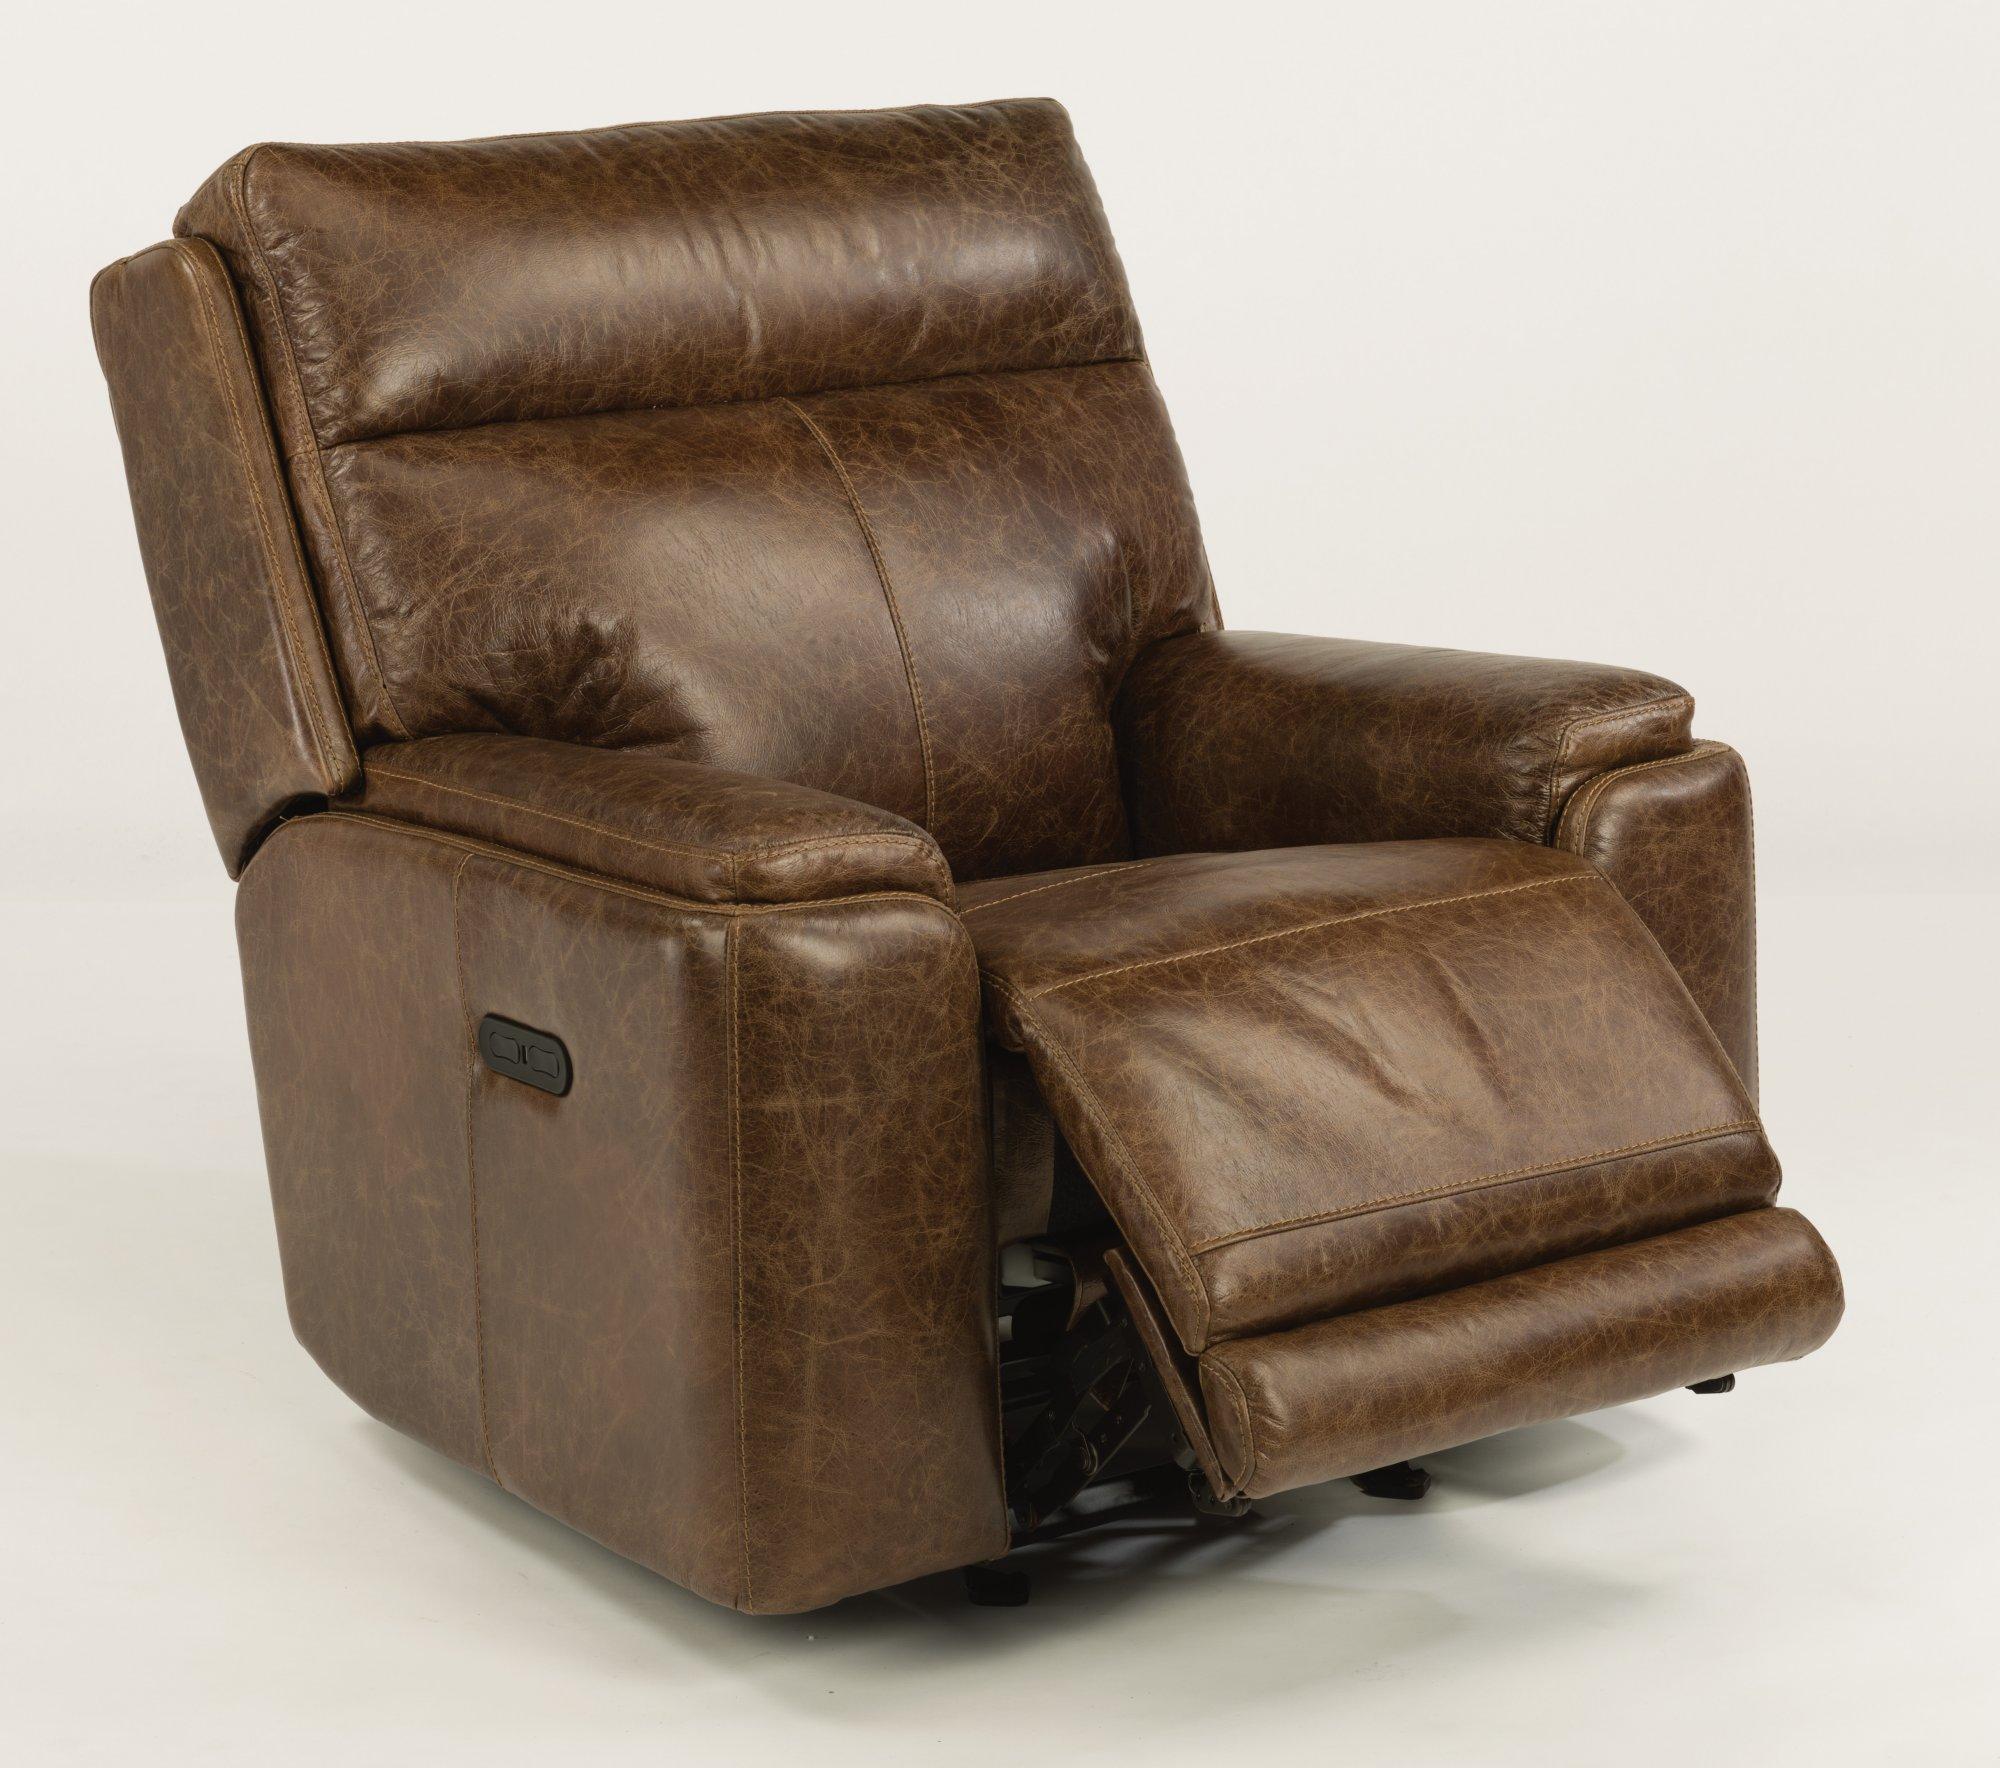 Astonishing Flexsteel 1675 54Ph Sienna Leather Power Gliding Evergreenethics Interior Chair Design Evergreenethicsorg